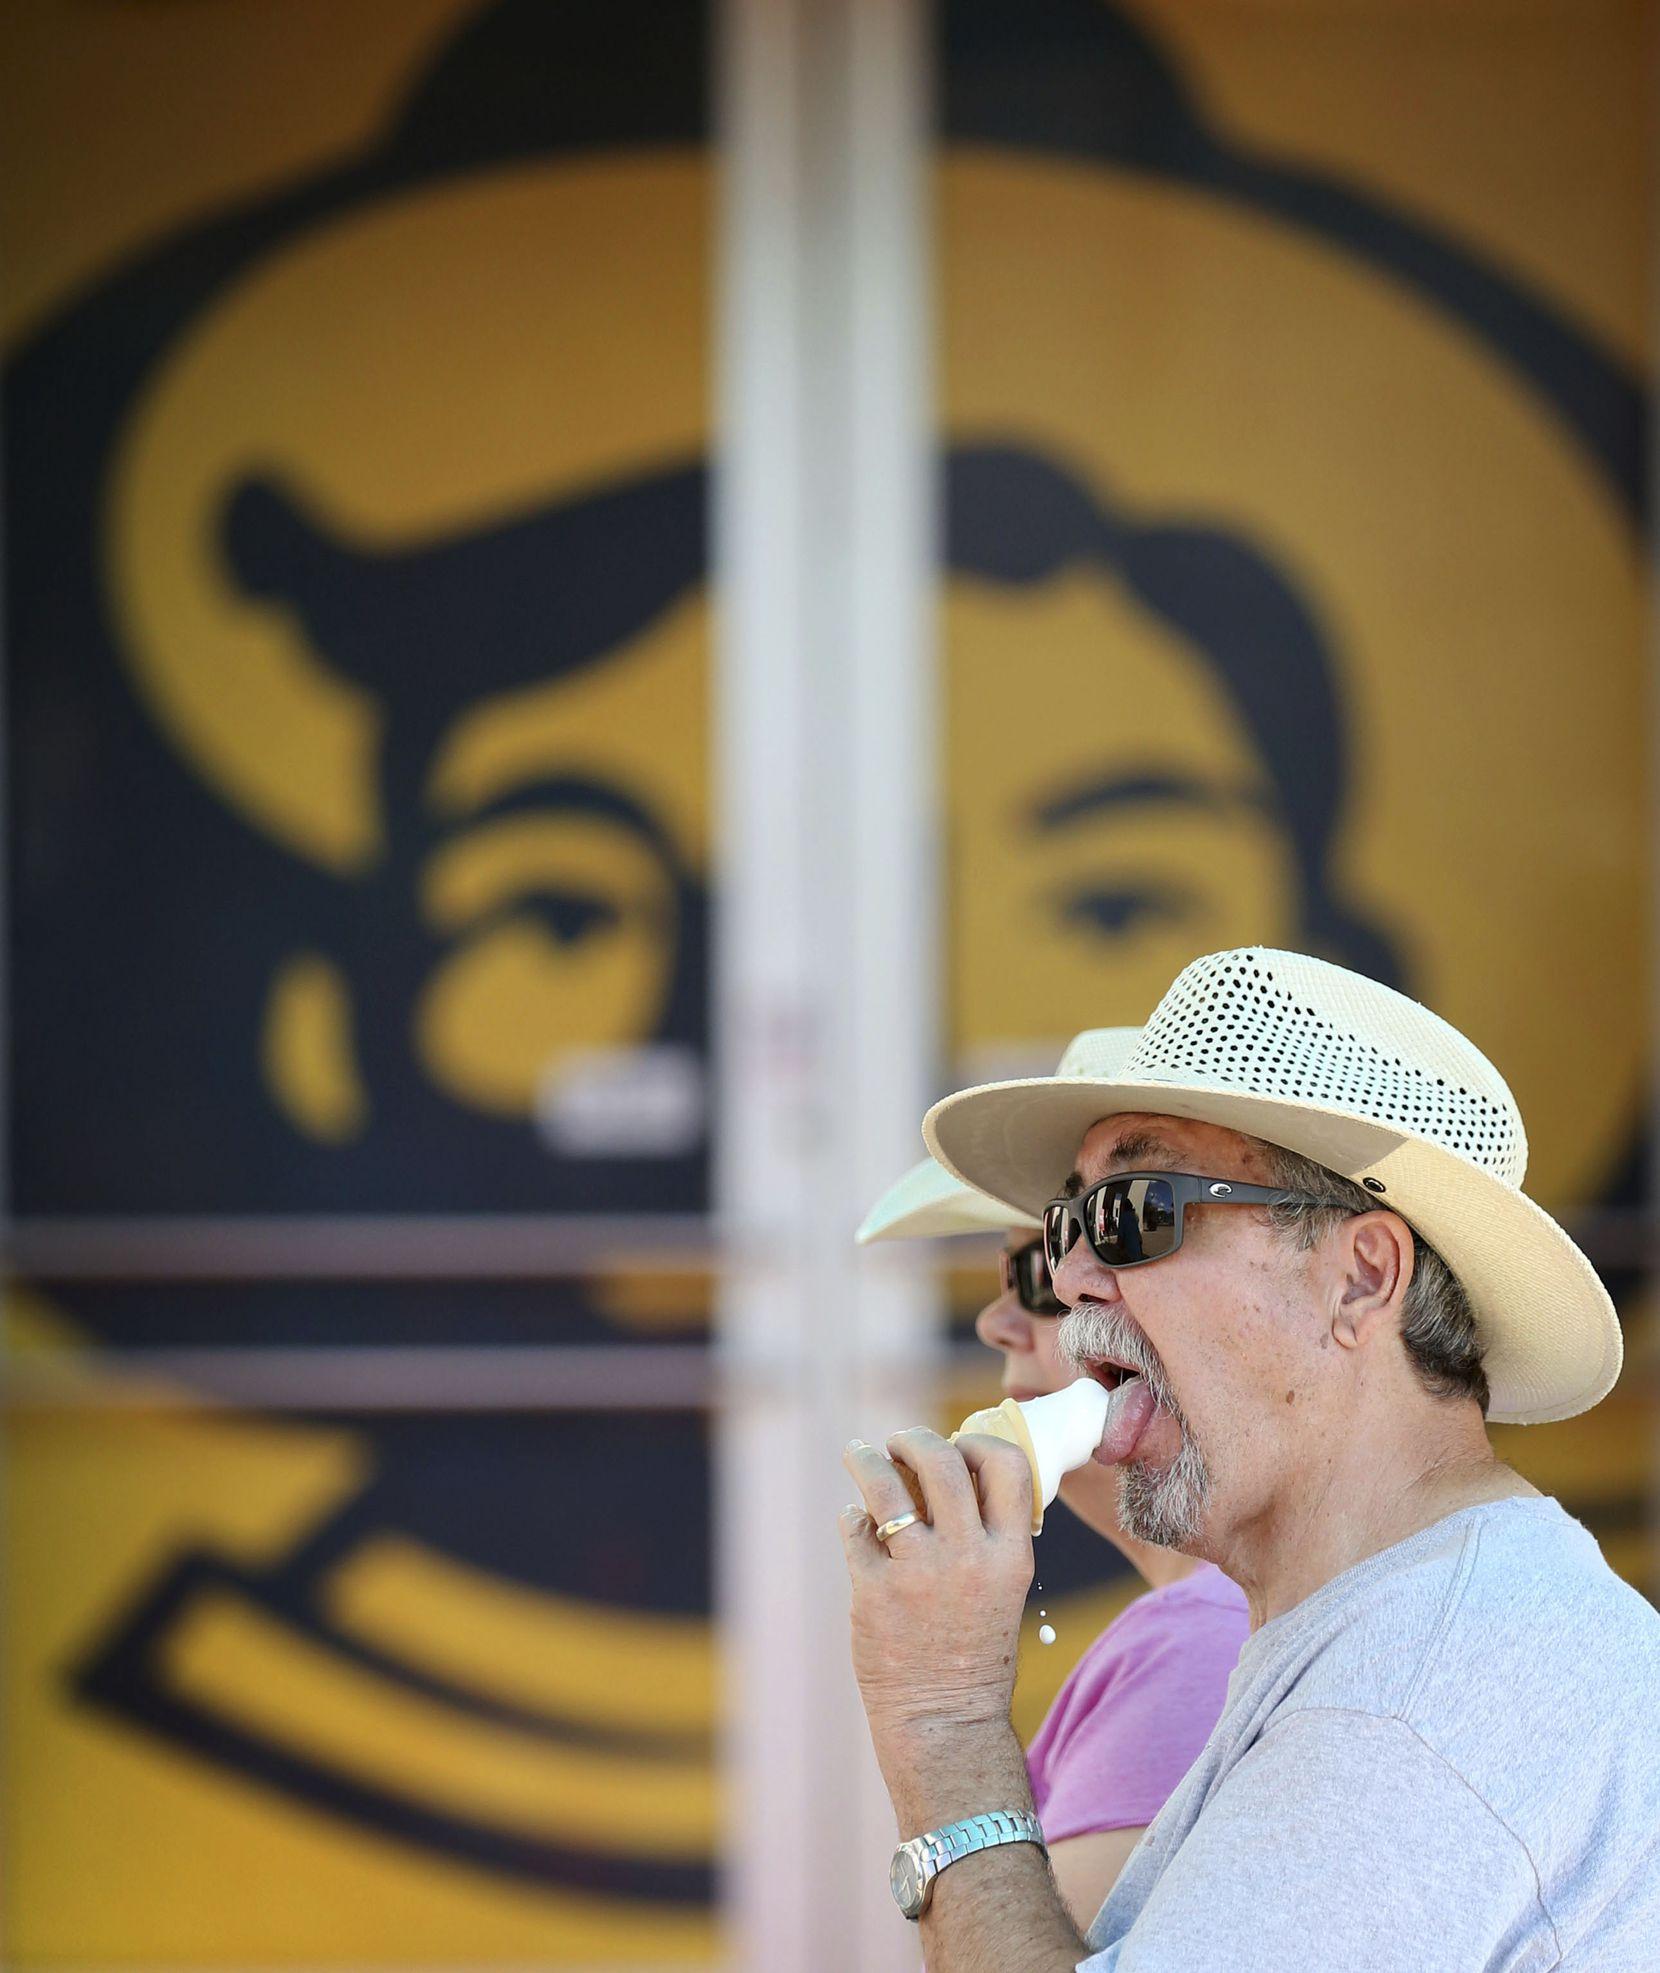 Steve Bradshaw eats an ice cream cone at the State Fair of Texas at Fair Park in Dallas on senior citizen day, Thursday, Oct. 4, 2018.